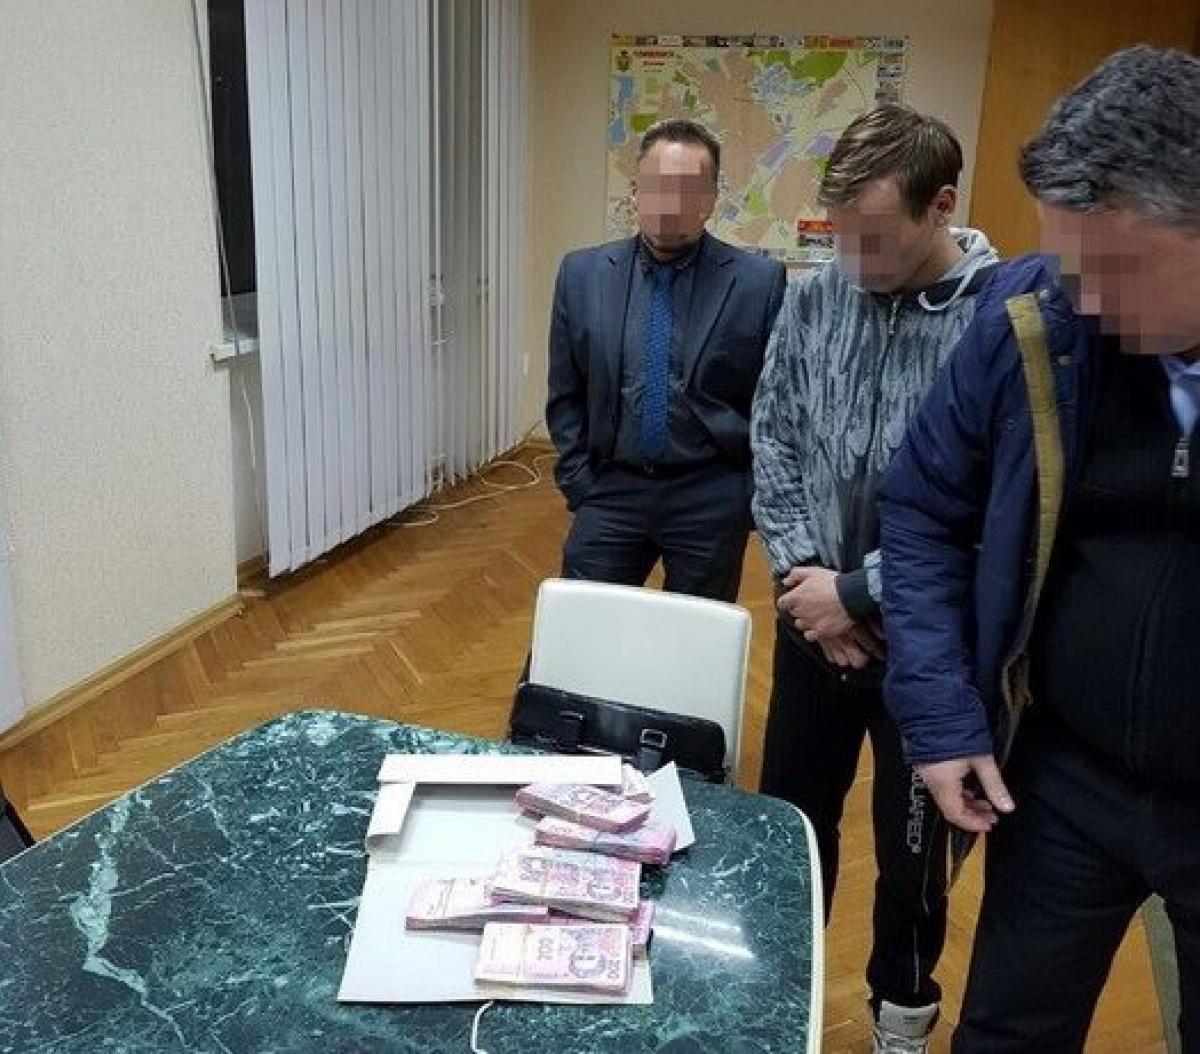 Заммэра Славянска попался на«мелкой» взятке